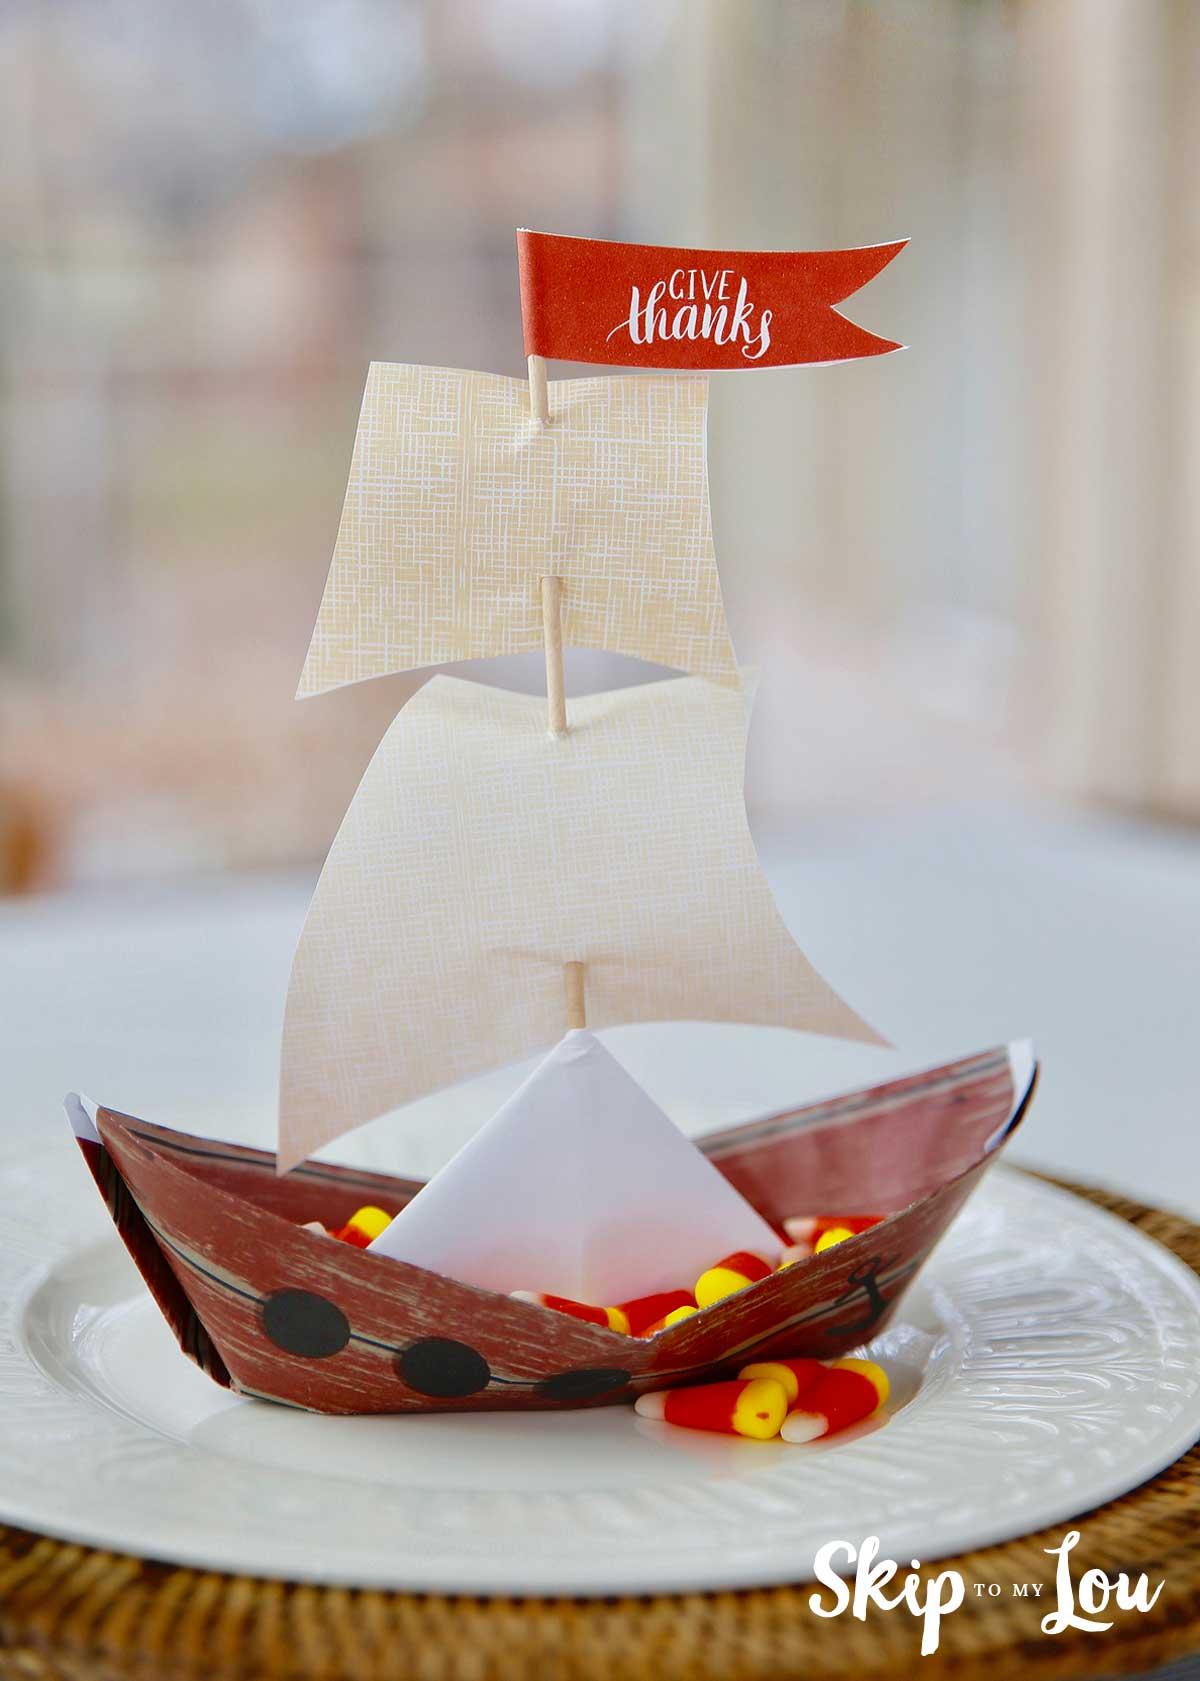 paper origami mayflower ship on white plate